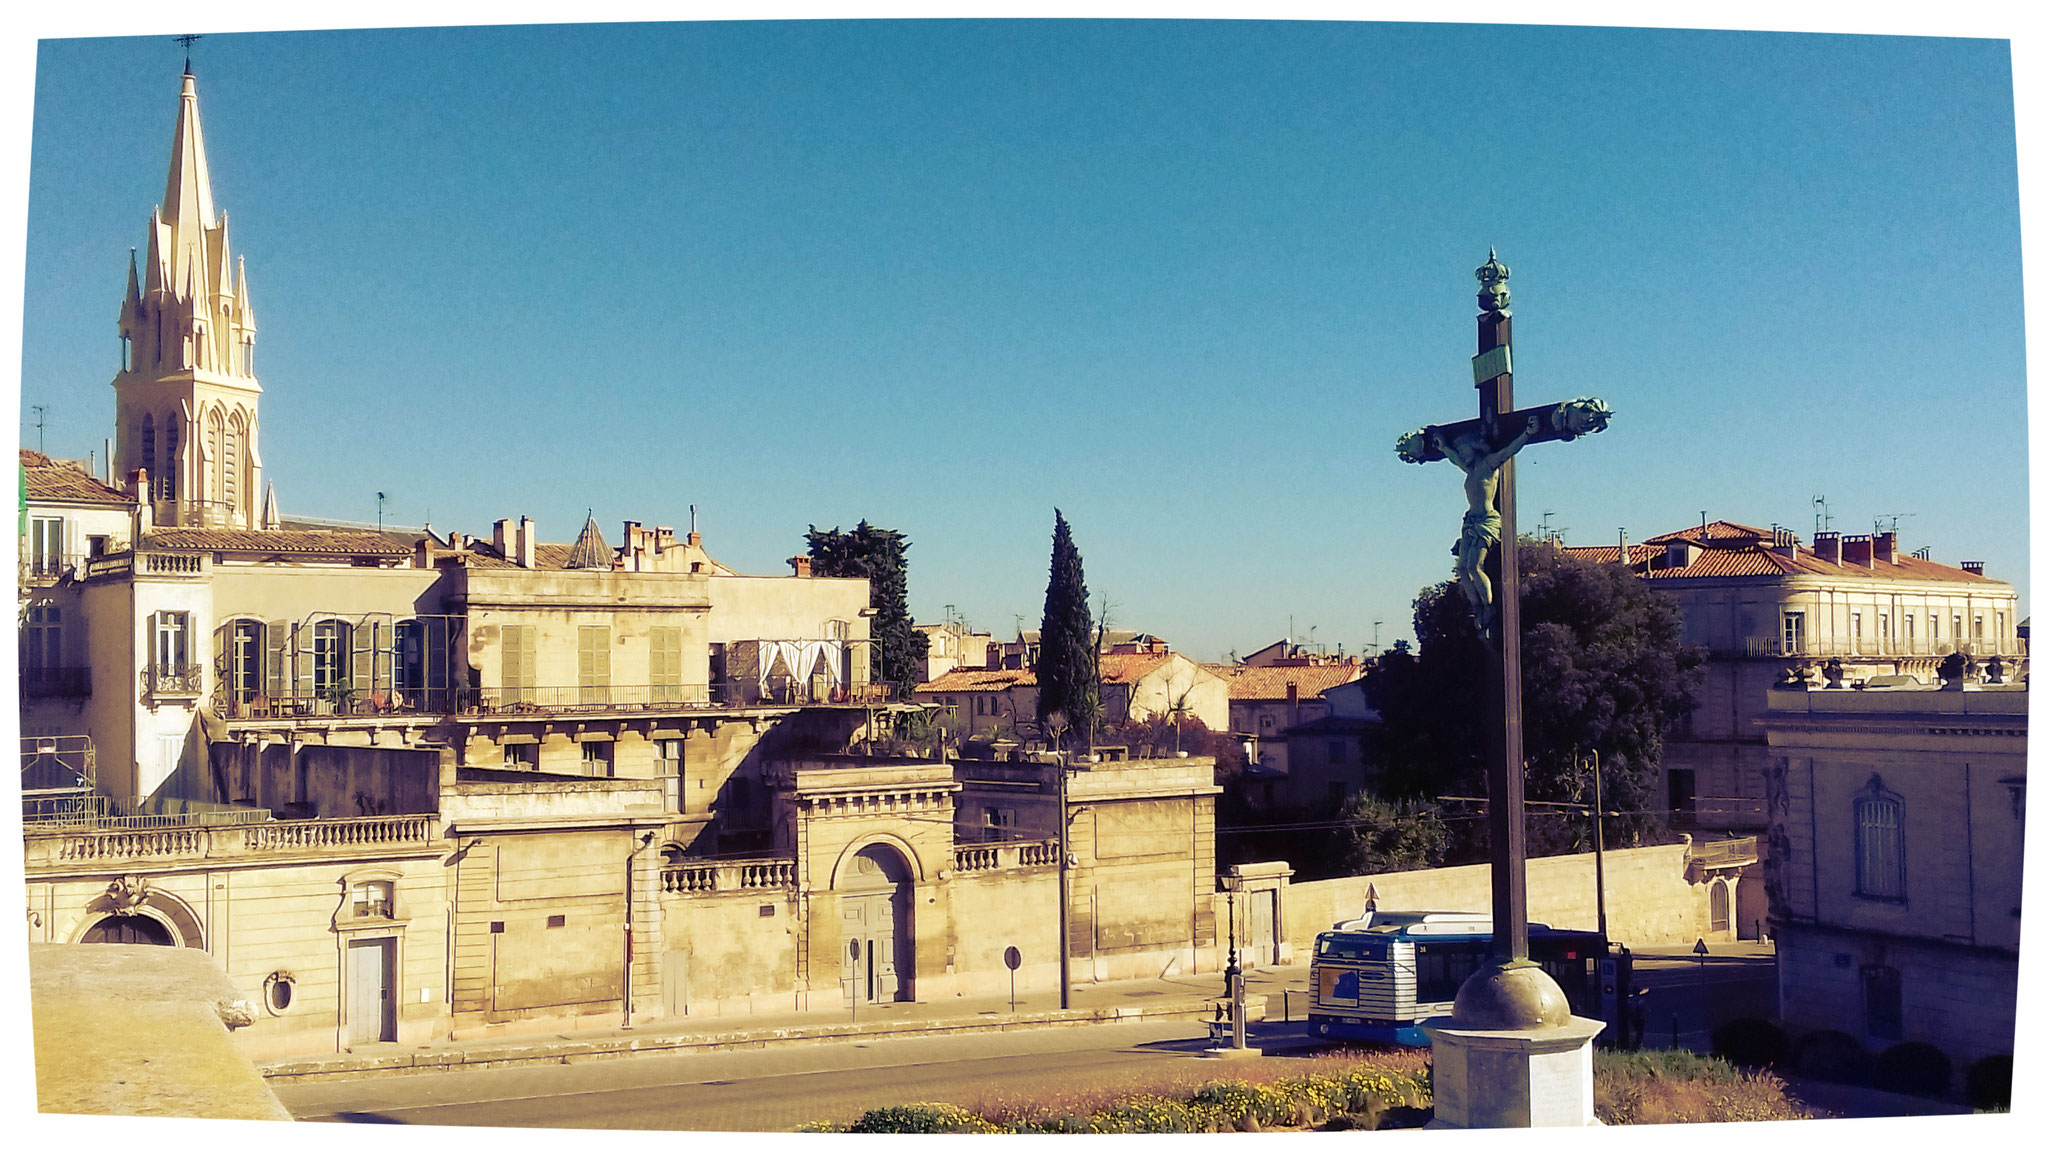 Montpellier, mon amour.